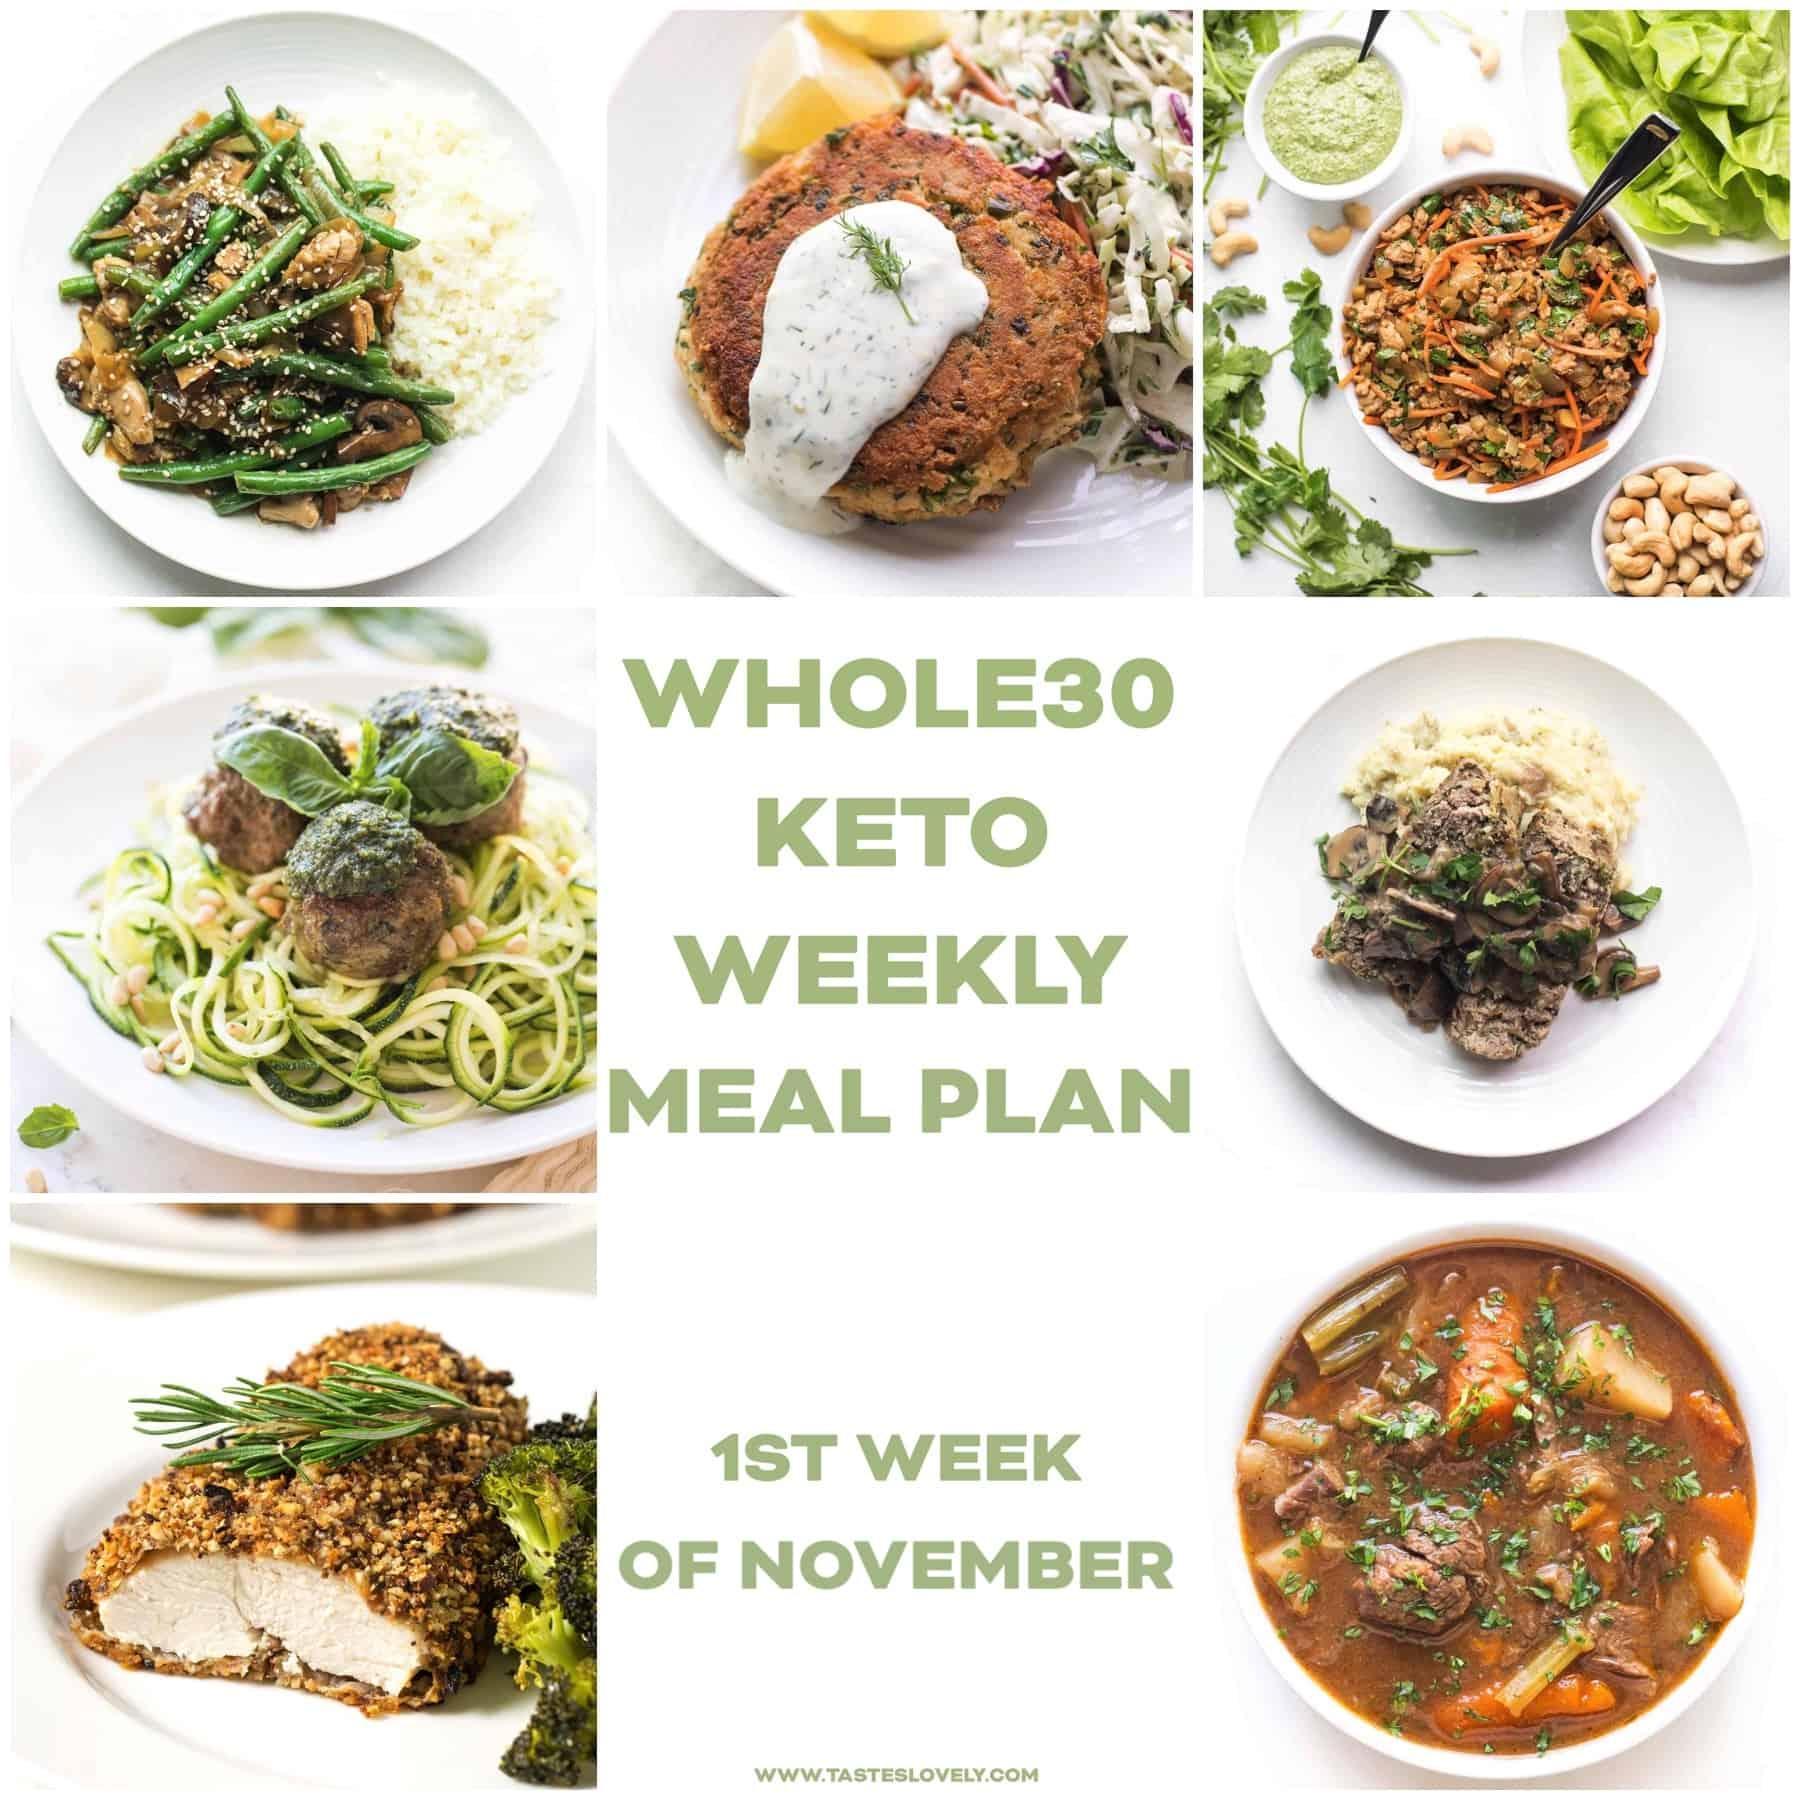 Whole30 keto weekly meal plan menu recipe roundup November week 1